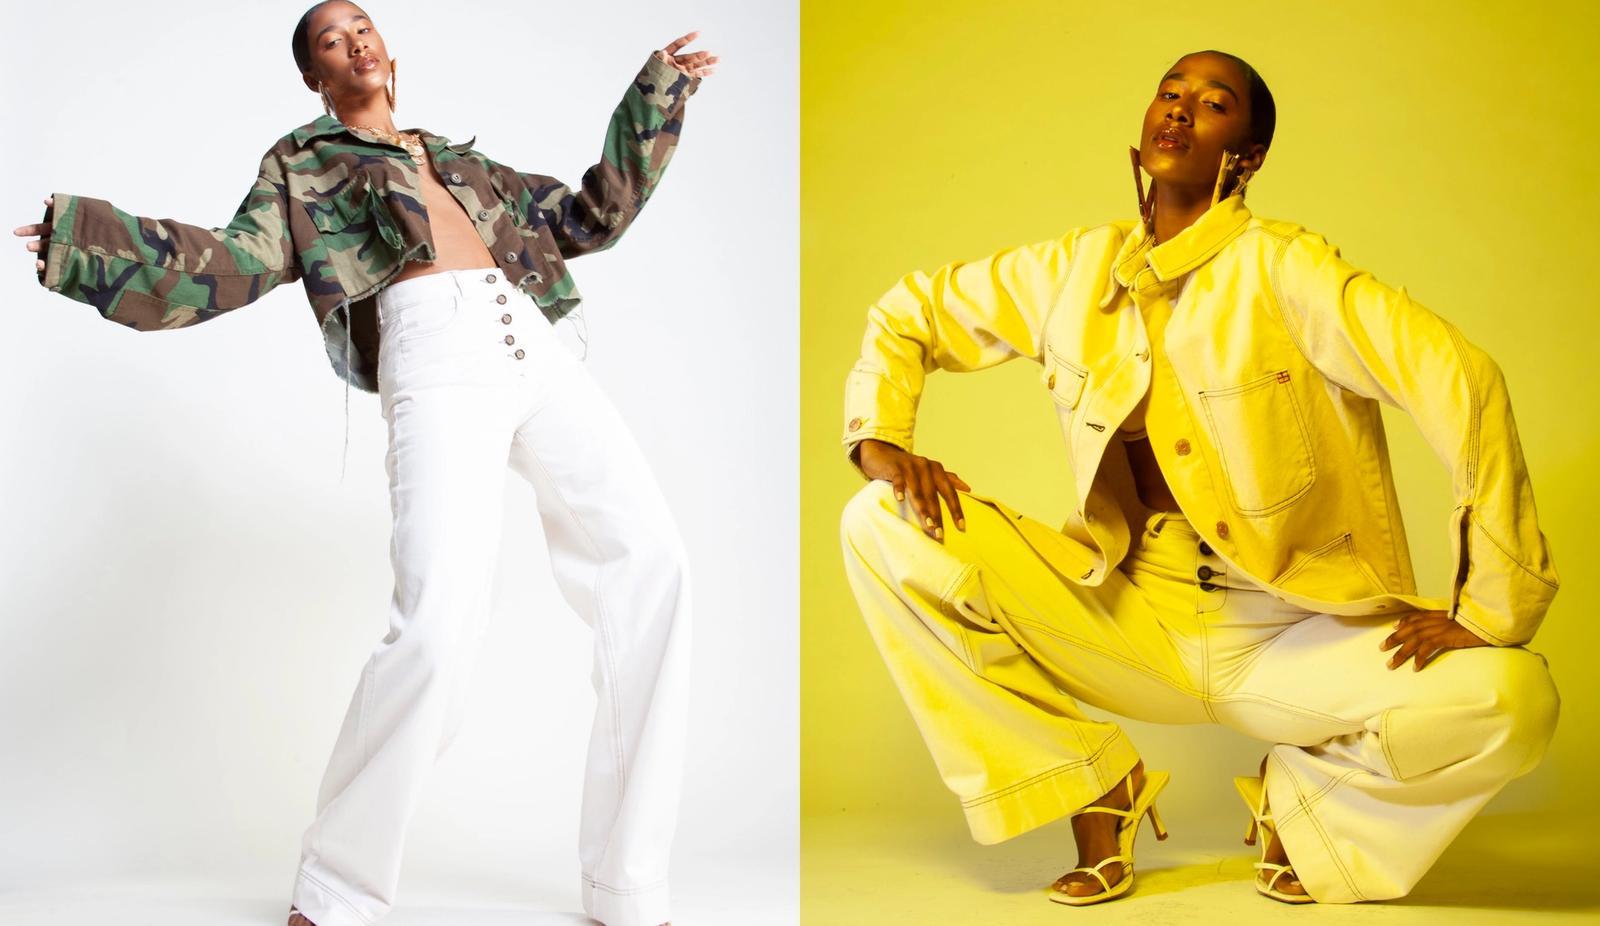 Stylist: Anita Johnson, Photographer: Yi Jeat, Model: Deja Tenise